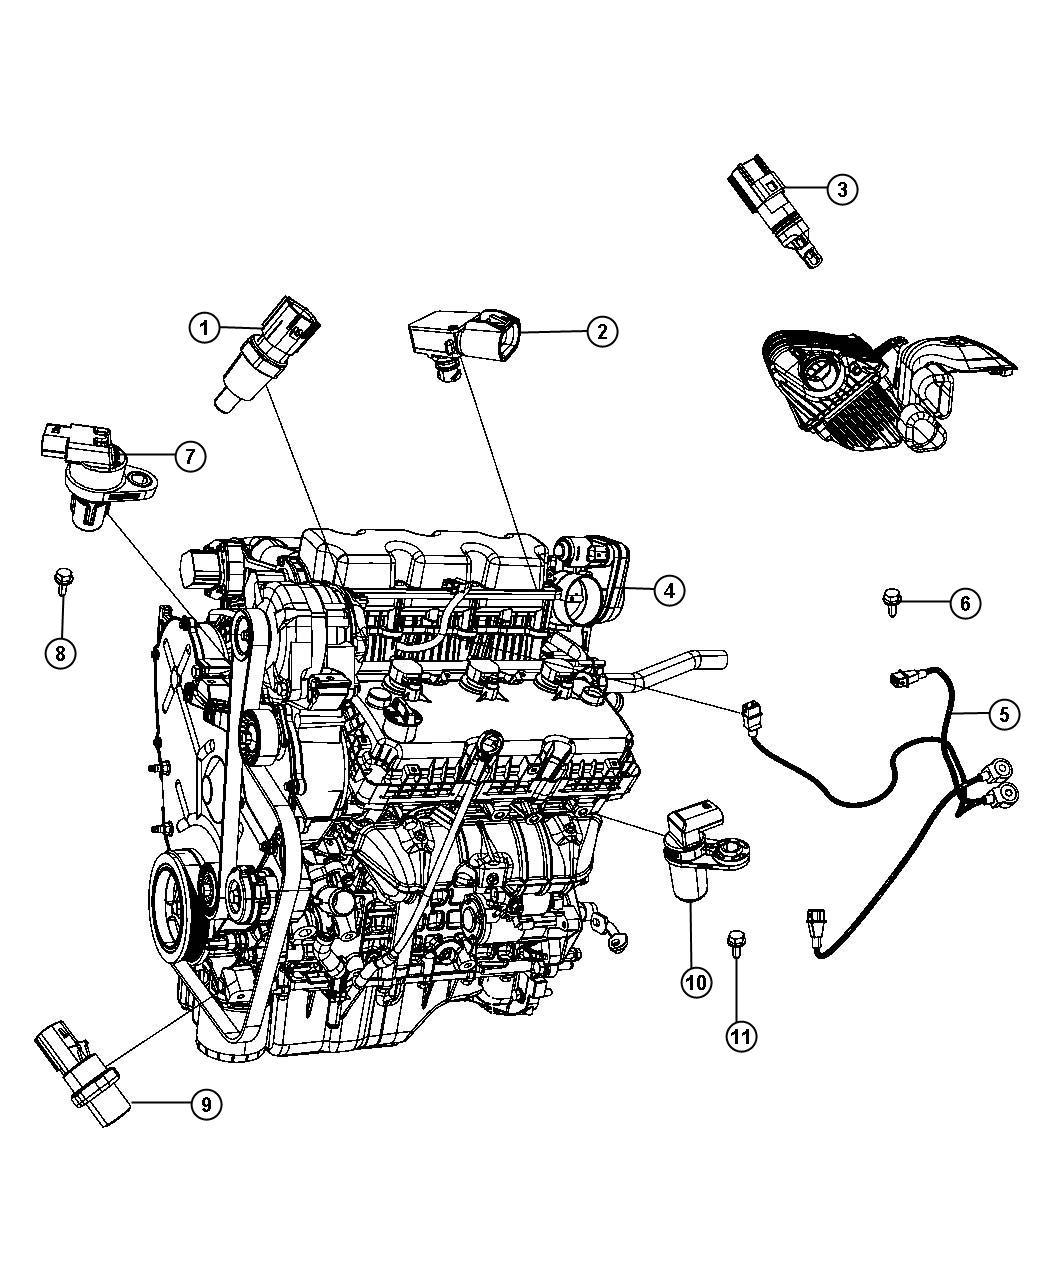 Chrysler Sebring Sensor Camshaft Electronic Gas